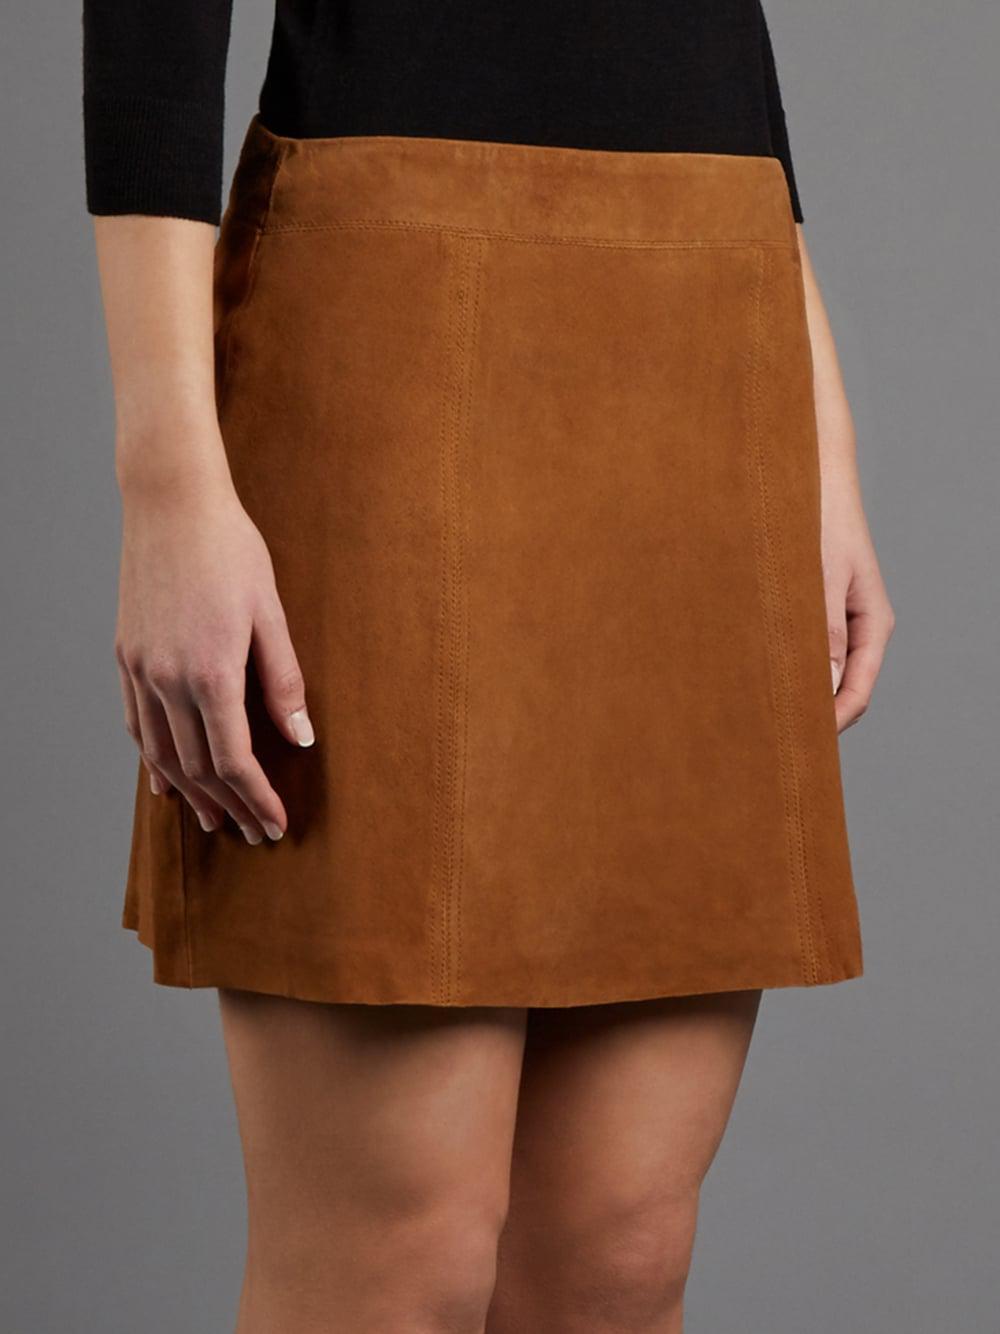 eba605d17c Muubaa Flore Tan Suede Mini Skirt in Brown - Lyst